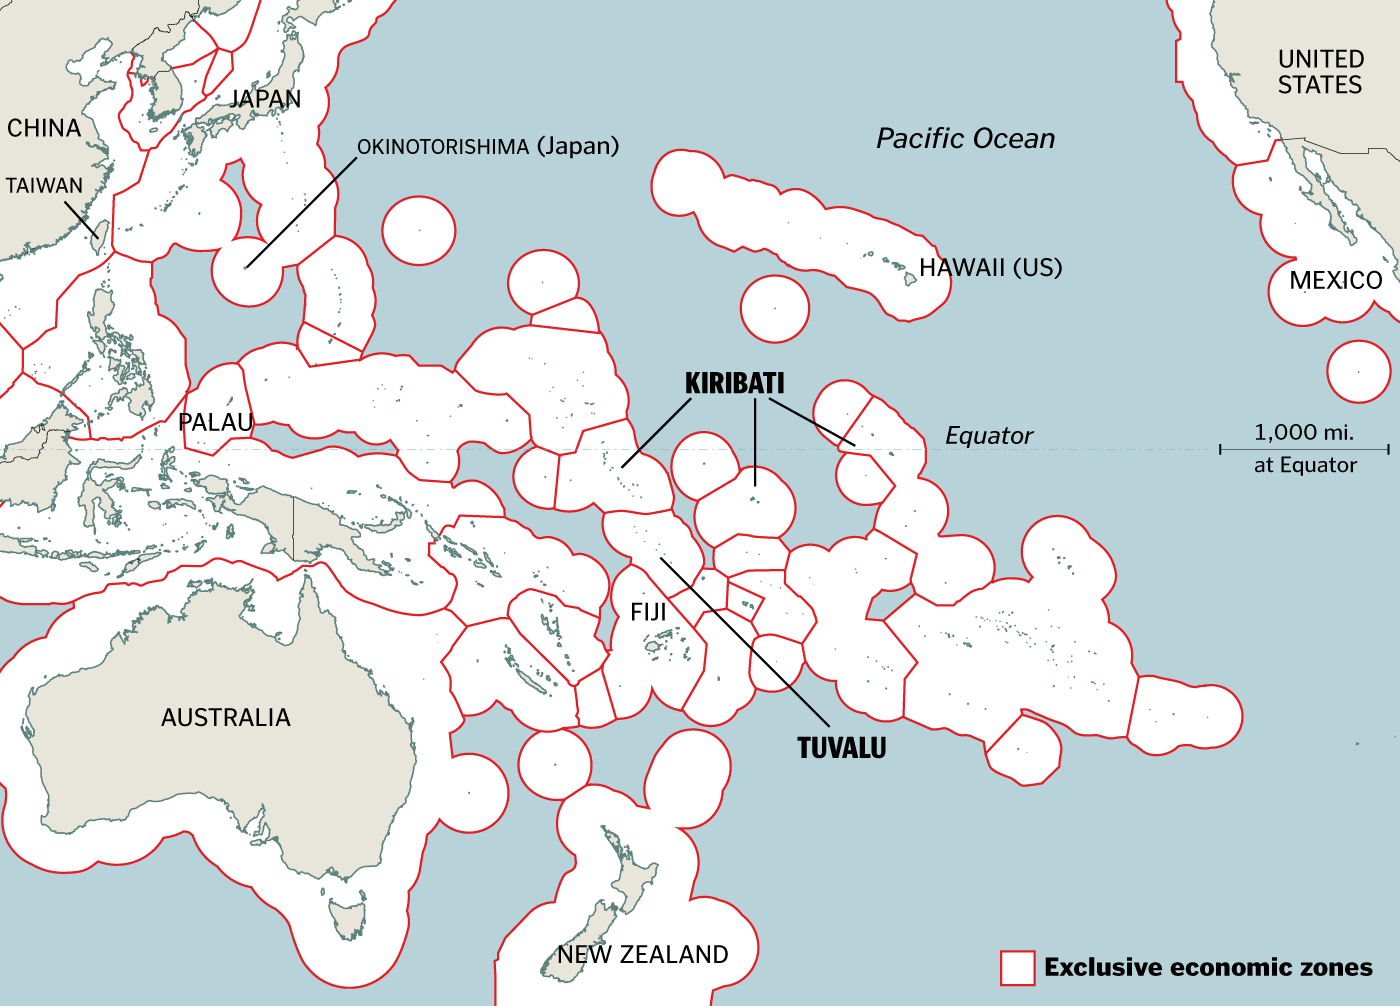 EEZs - Us eez map